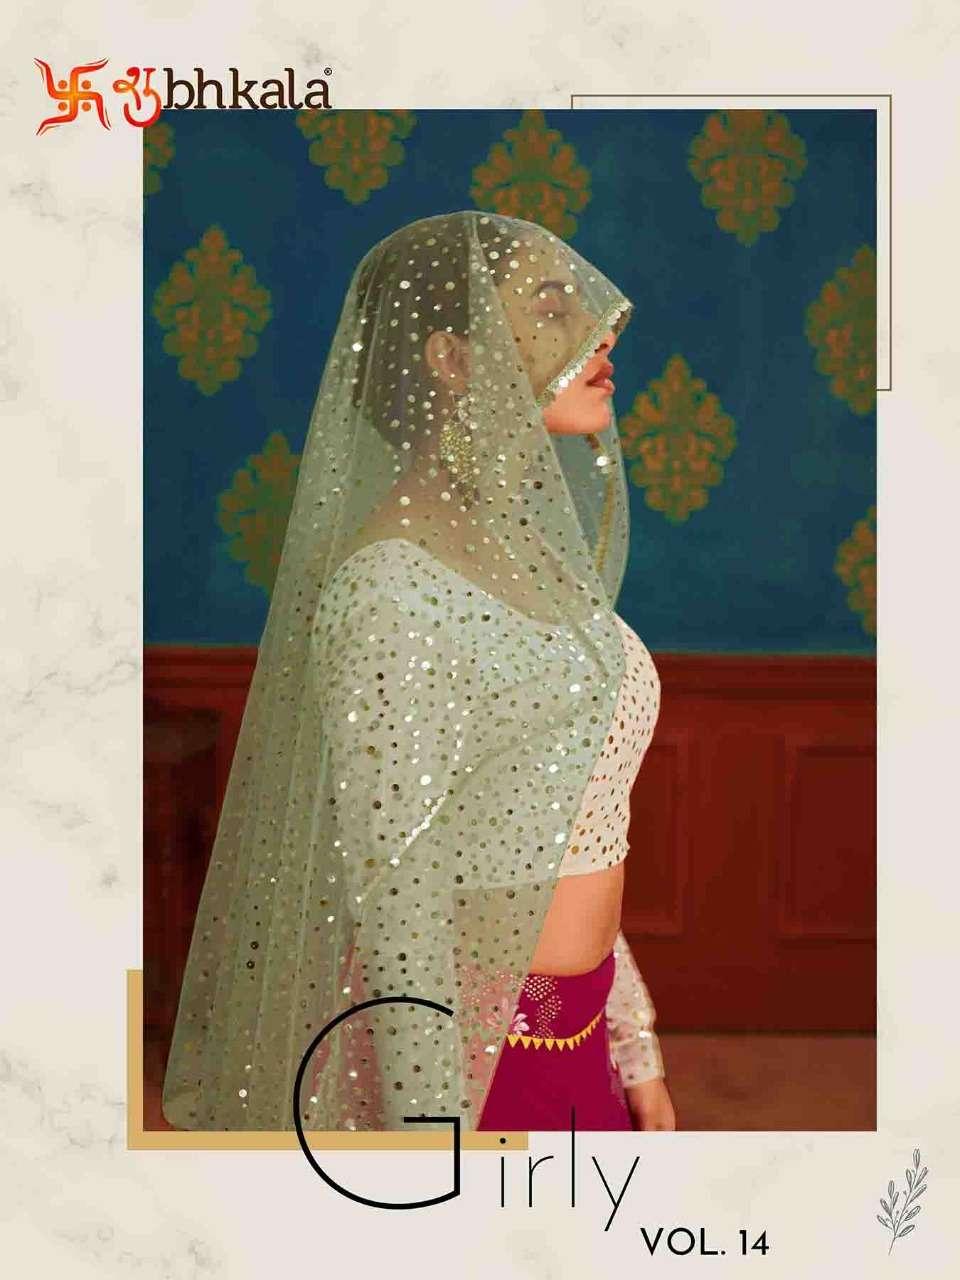 Girly Vol. 14 Exclusive Semi Stitched Lehenga Choli With Dupatta By Shubhkala